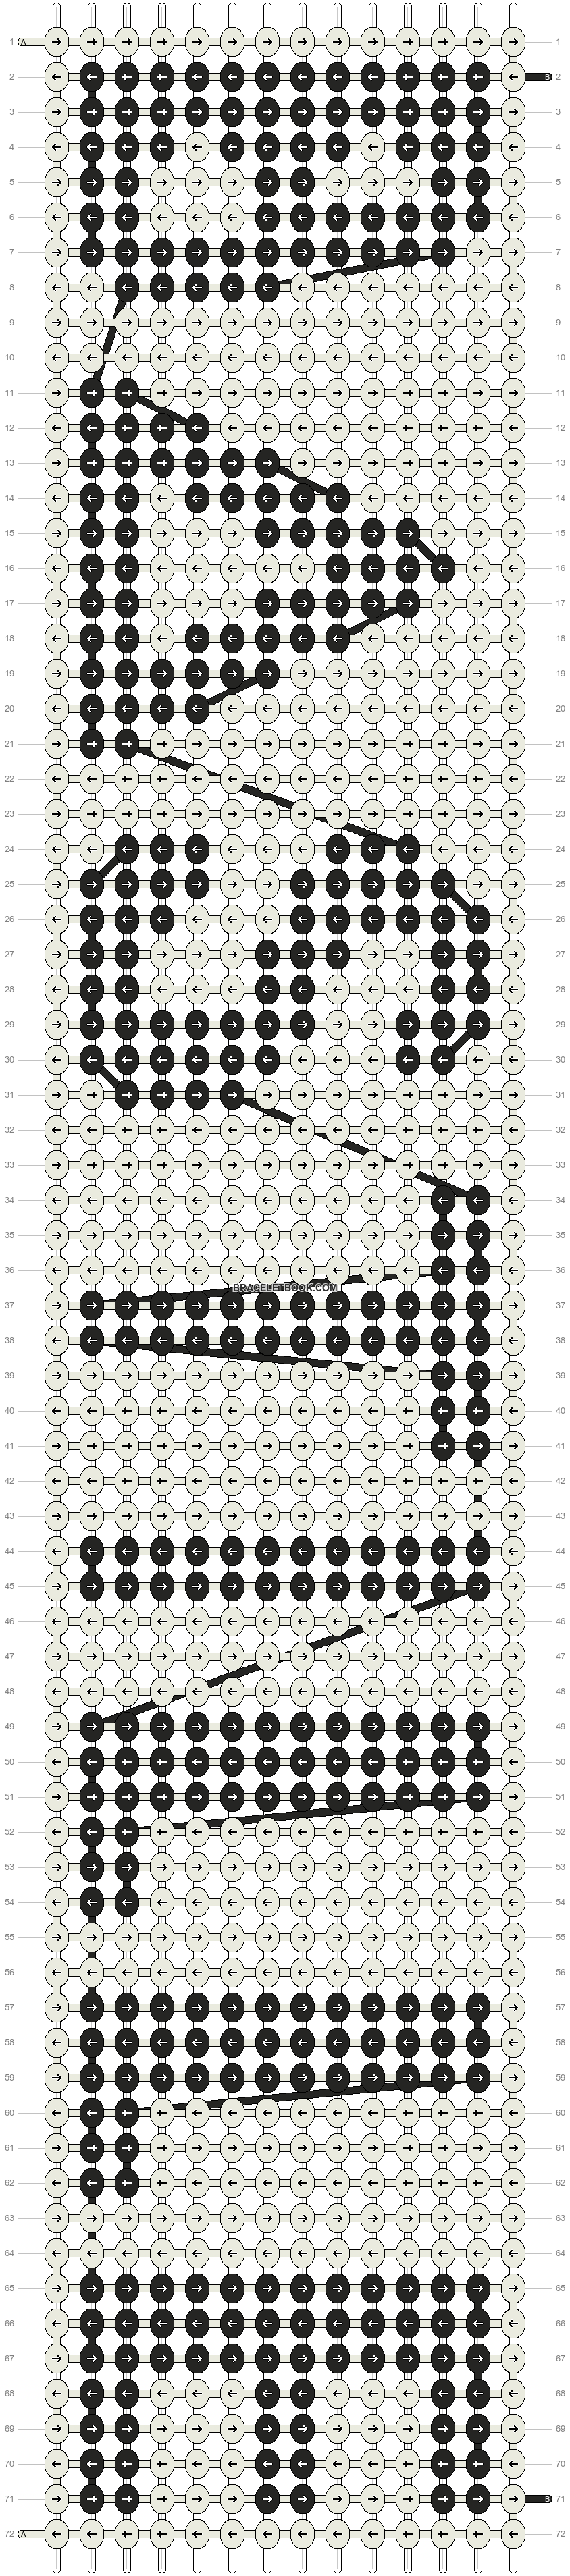 Alpha pattern #13325 pattern